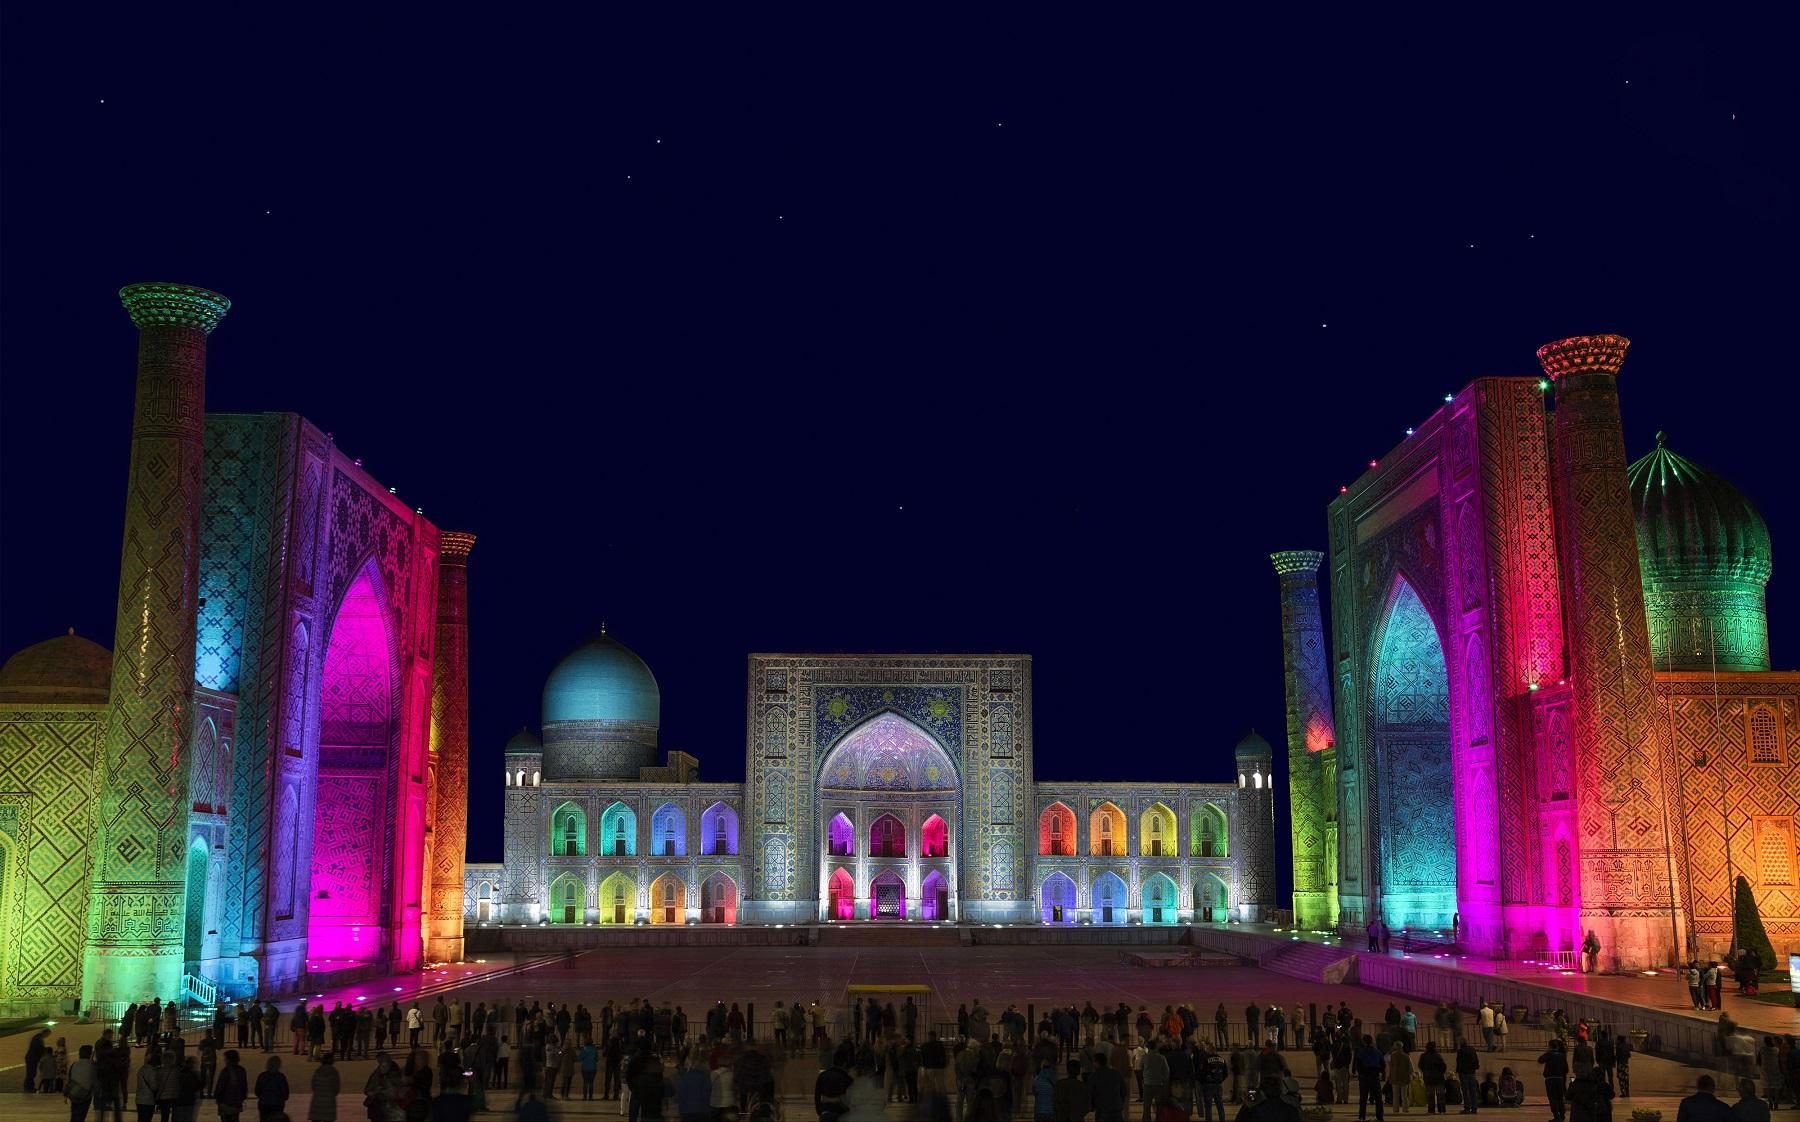 View of Registan square in Samarkand with Ulugbek madrassas, Sherdor madrassas and Tillya-Kari madrassas at night during the color show. Uzbekistan